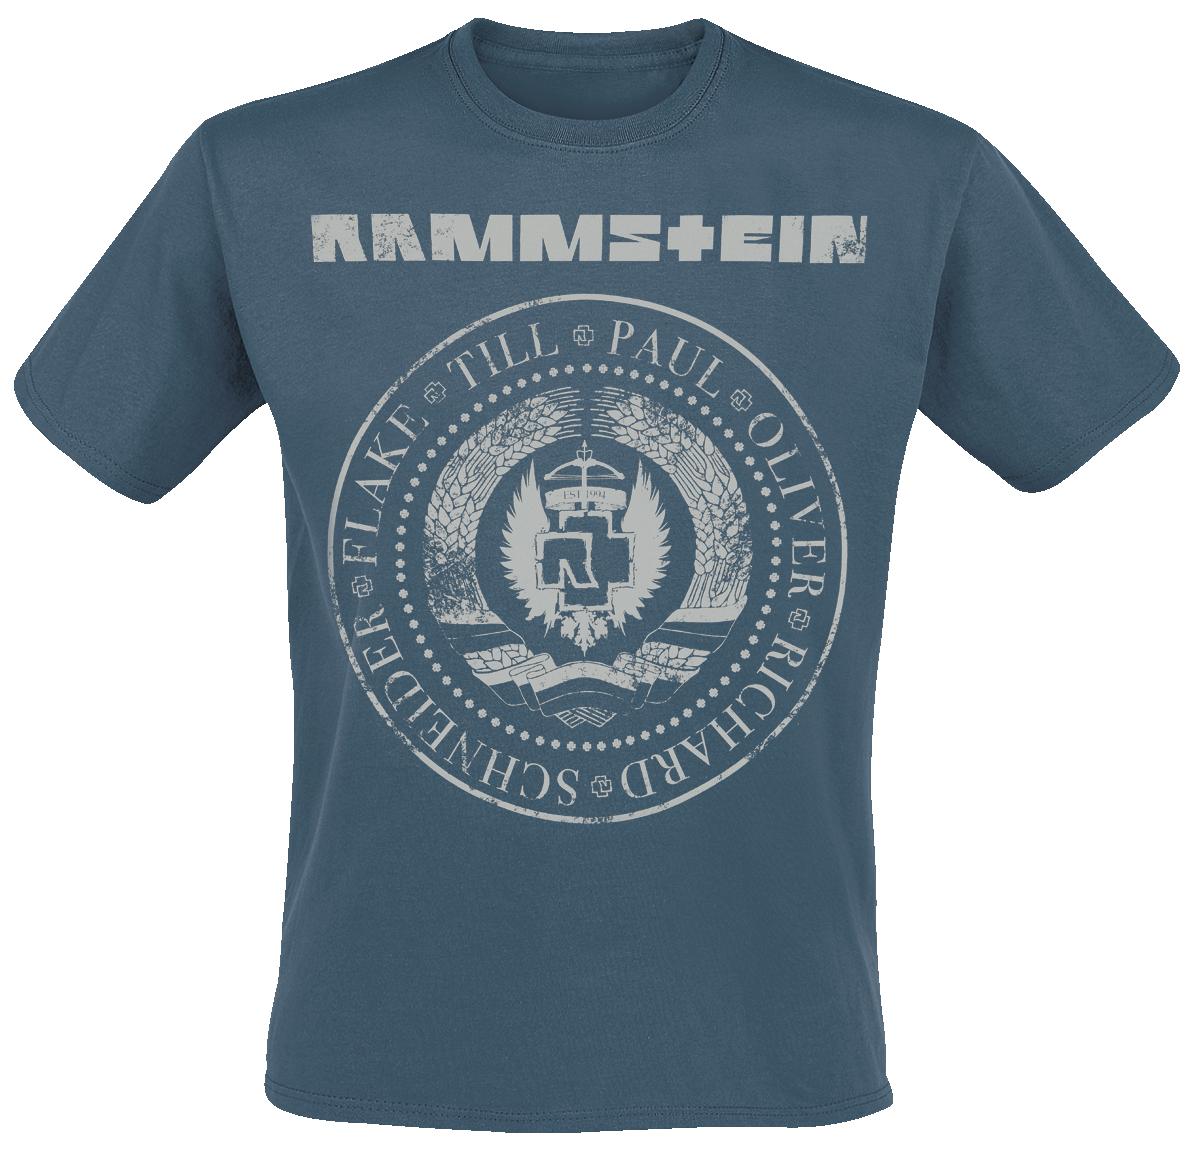 Rammstein - Est. 1994 - T-Shirt - blau